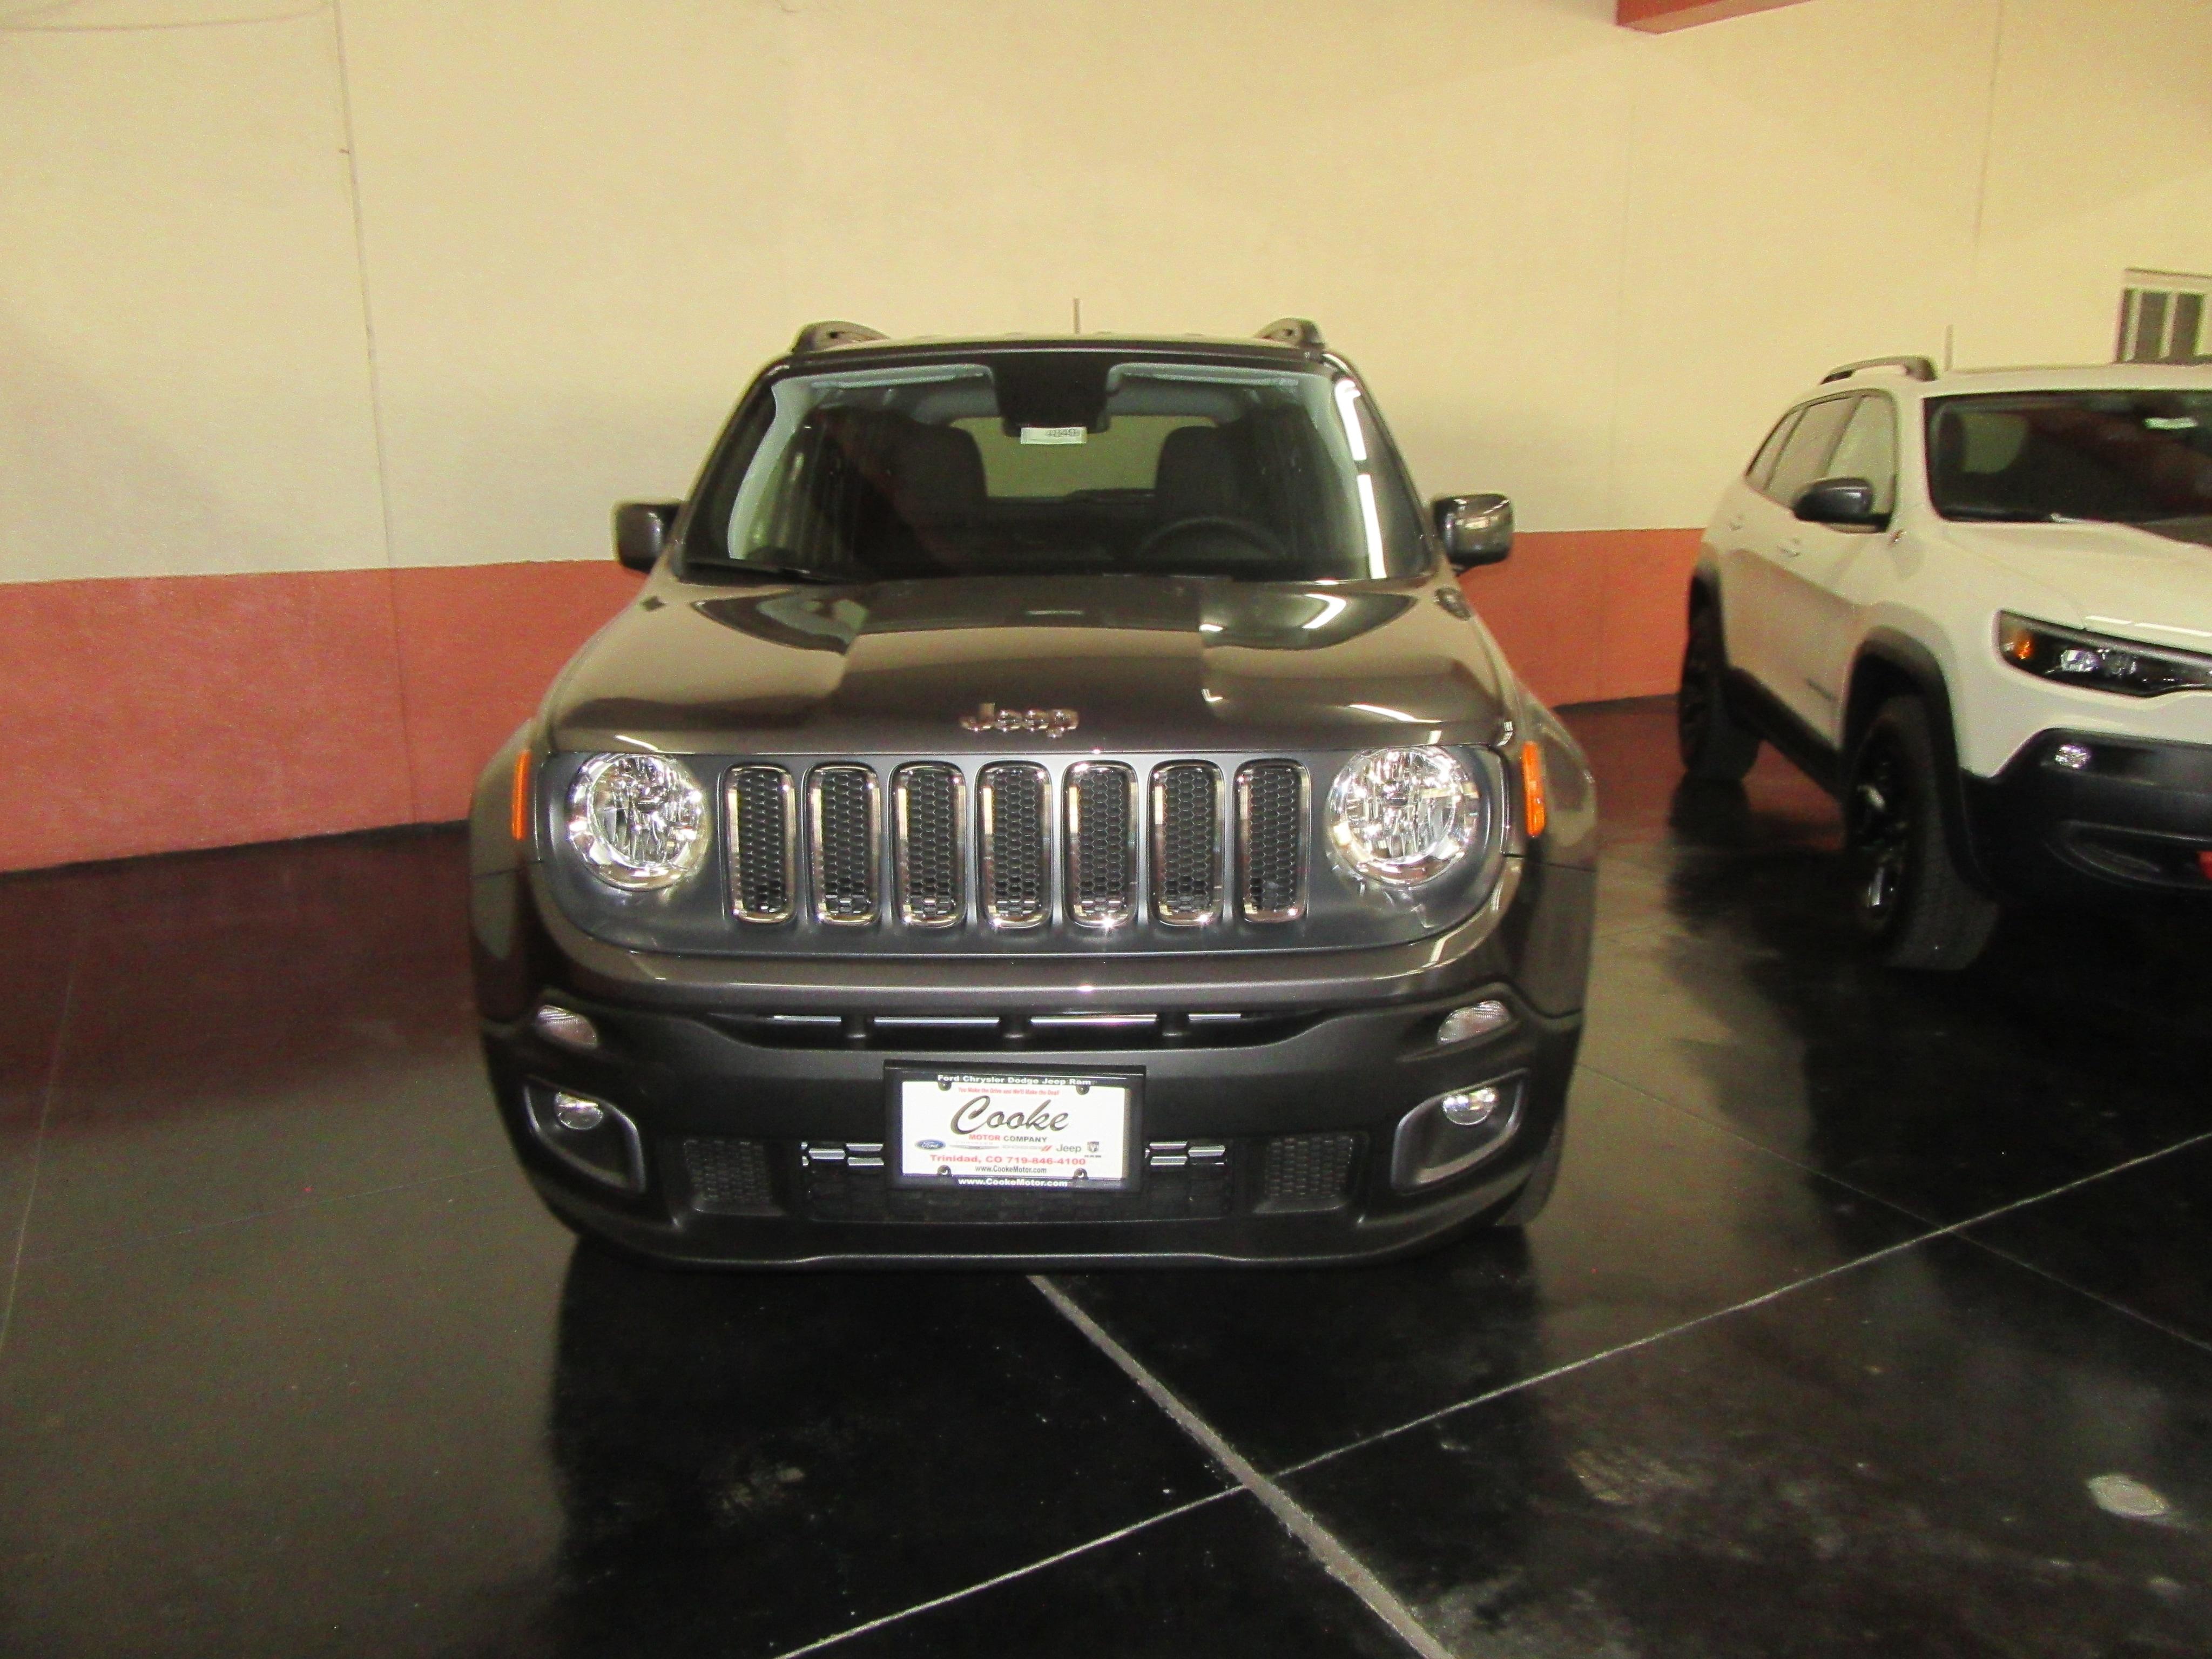 New 2018 Jeep Renegade LATITUDE 4X4 For Sale in Trinidad CO | ZACCJBBB5JPH00807 | Serving Walsenburg, Alamosa, Raton NM and Pueblo